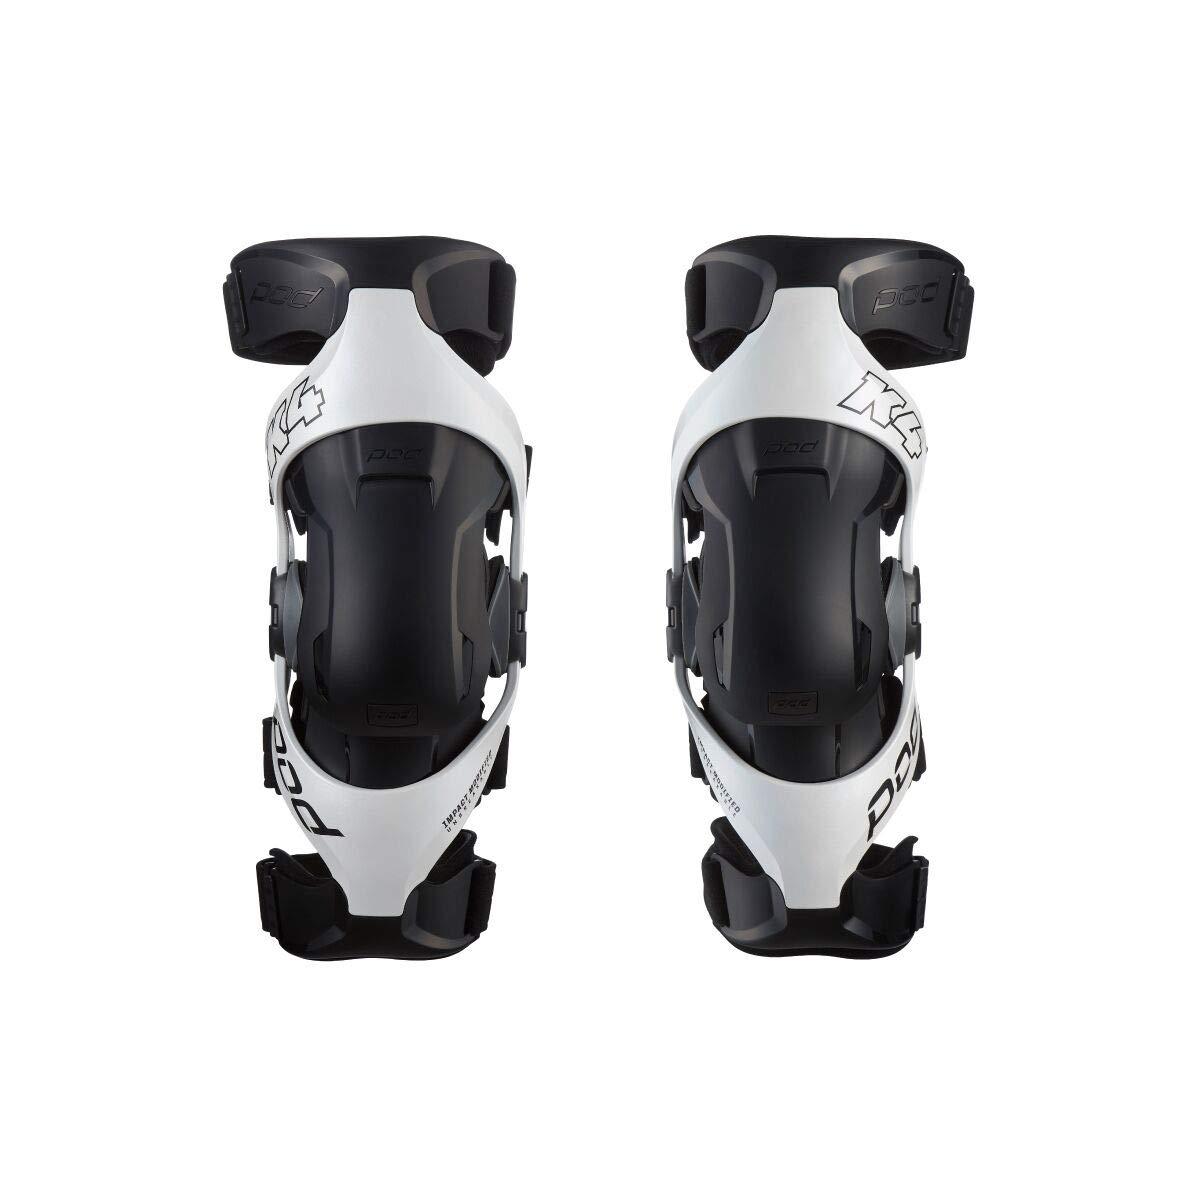 Pod K4 2.0 Knee Braces-White/Black-M/L